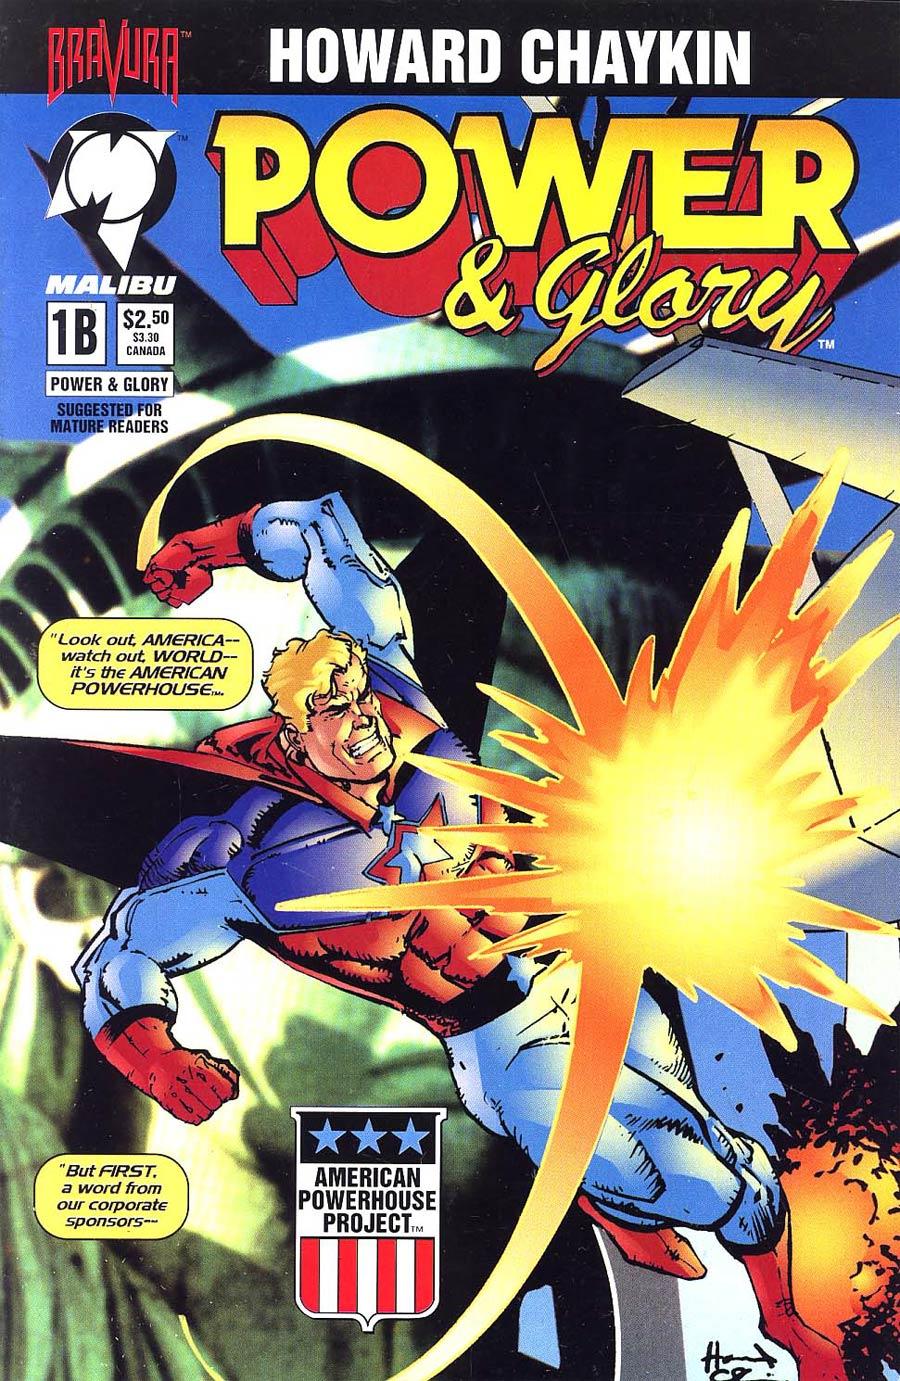 Power & Glory #1 Cover B